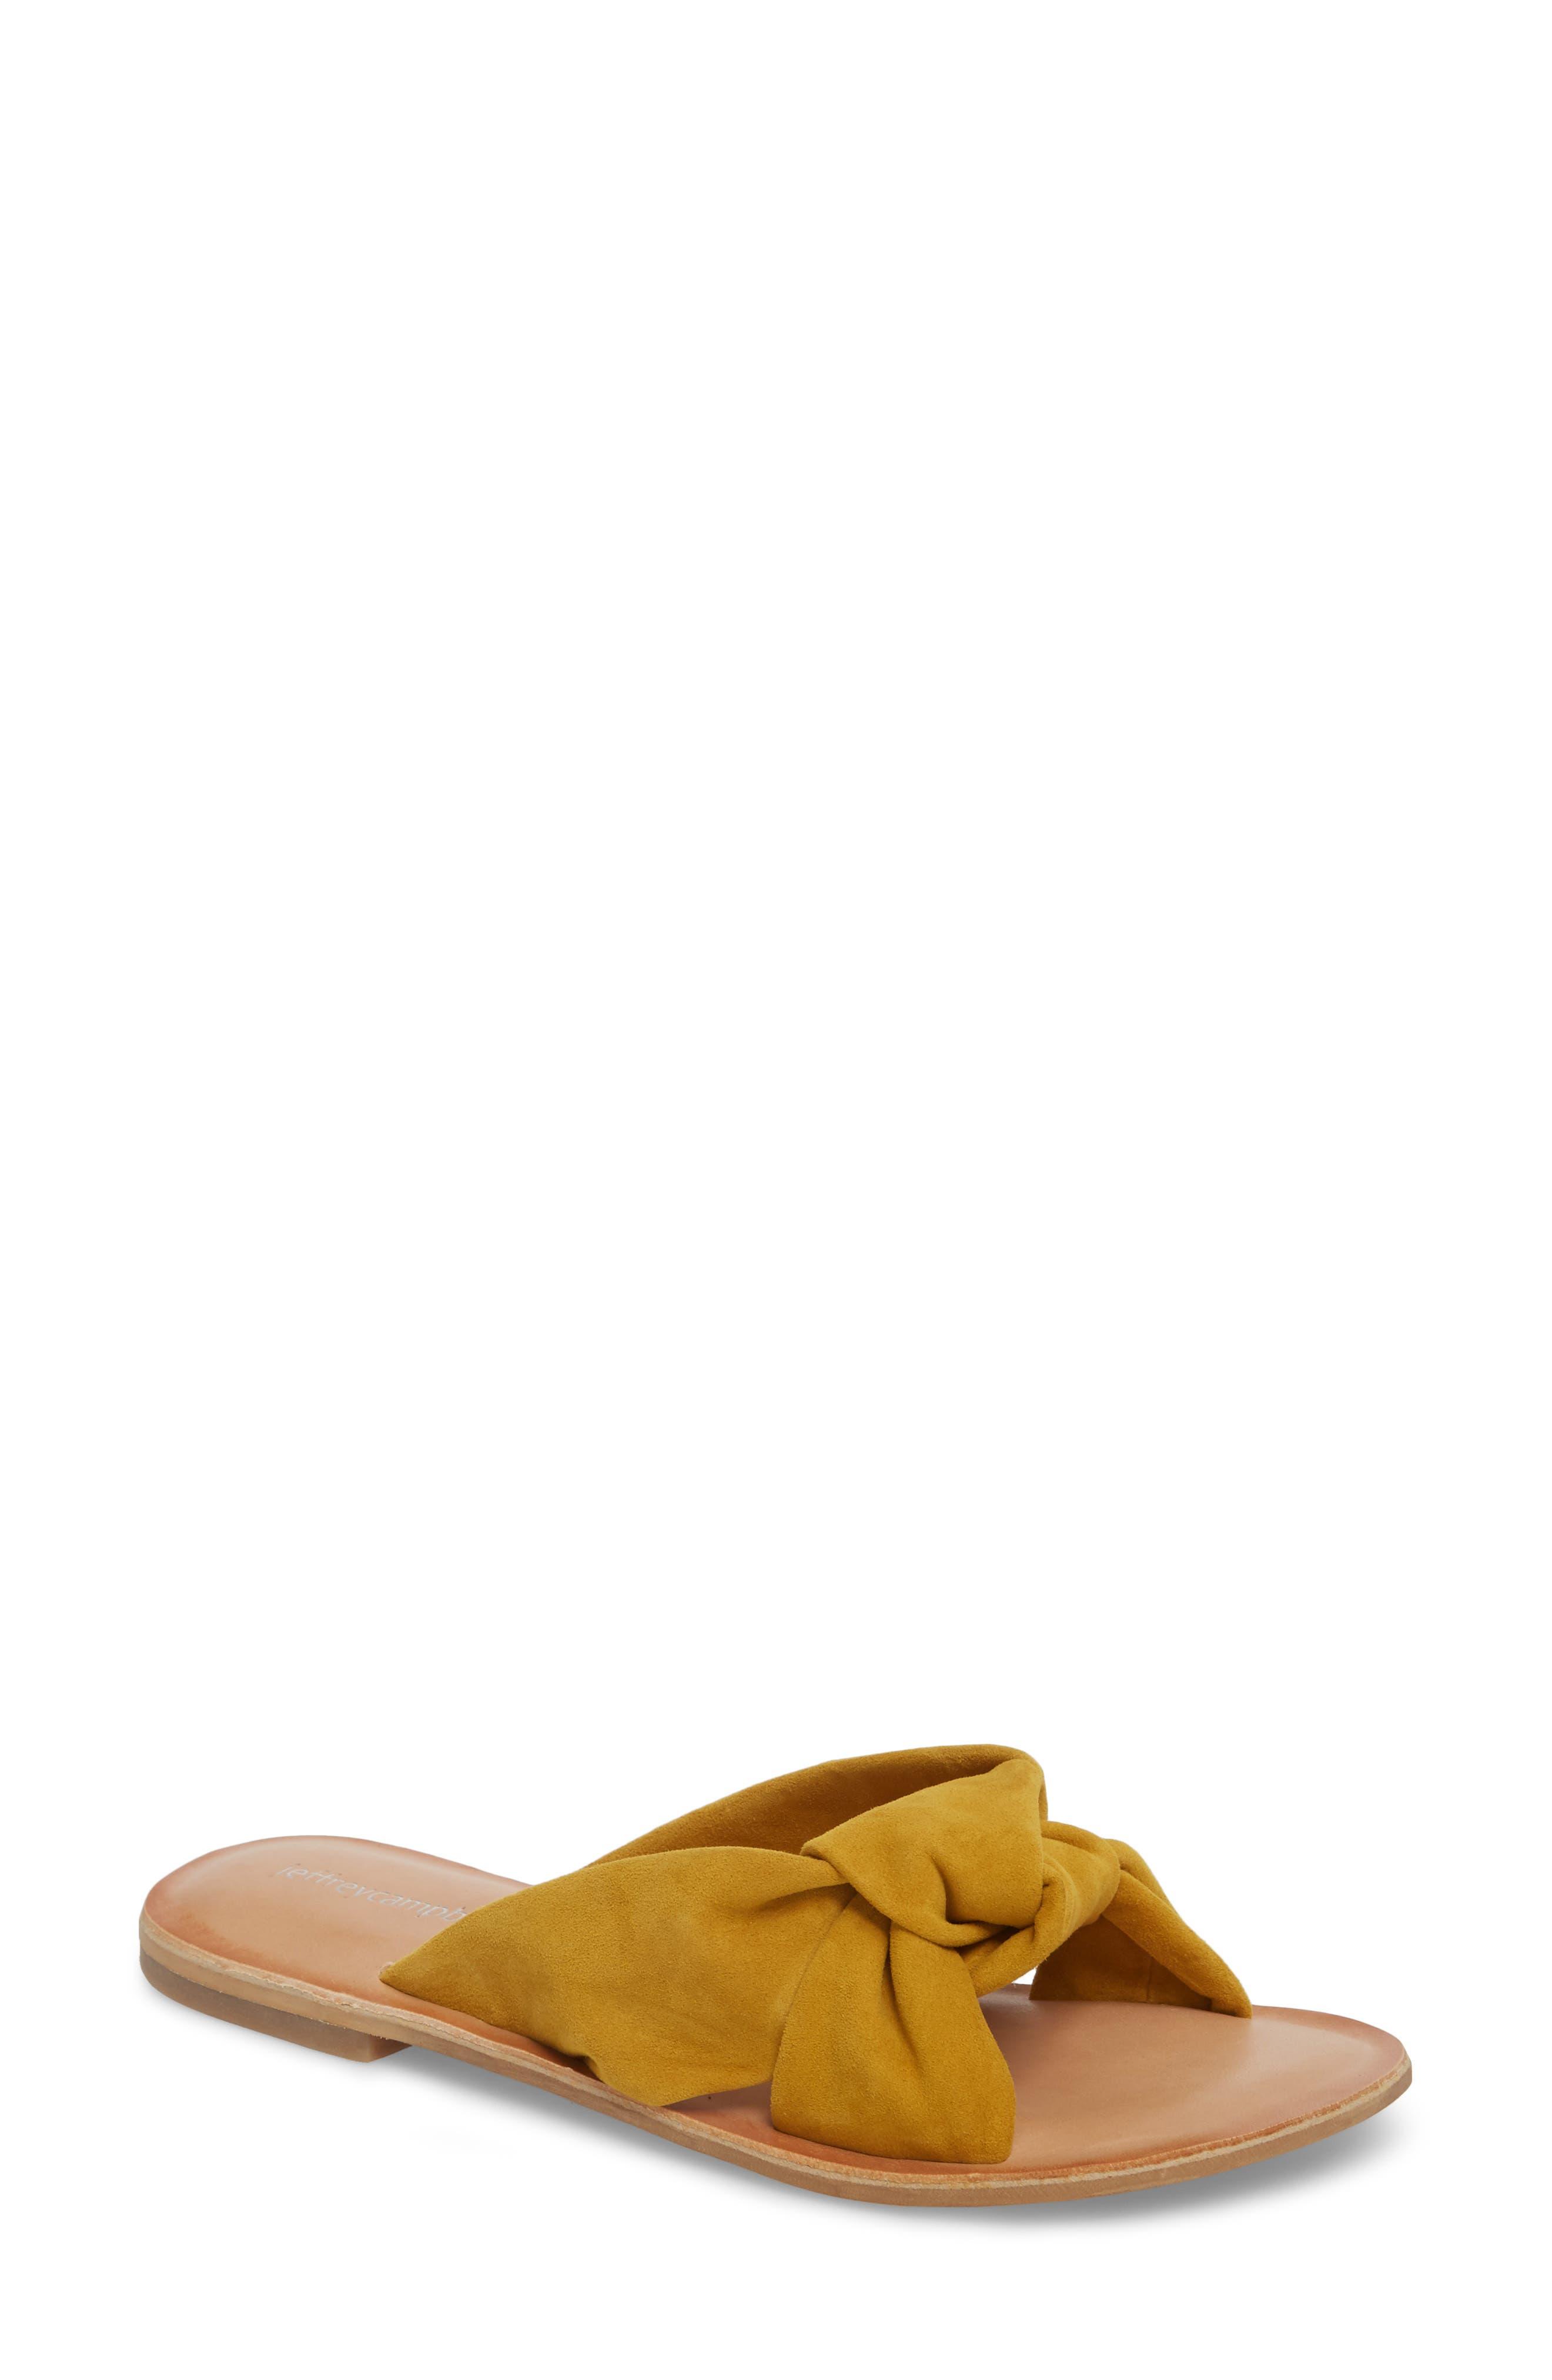 Zocalo Slide Sandal,                             Main thumbnail 1, color,                             Mustard Suede